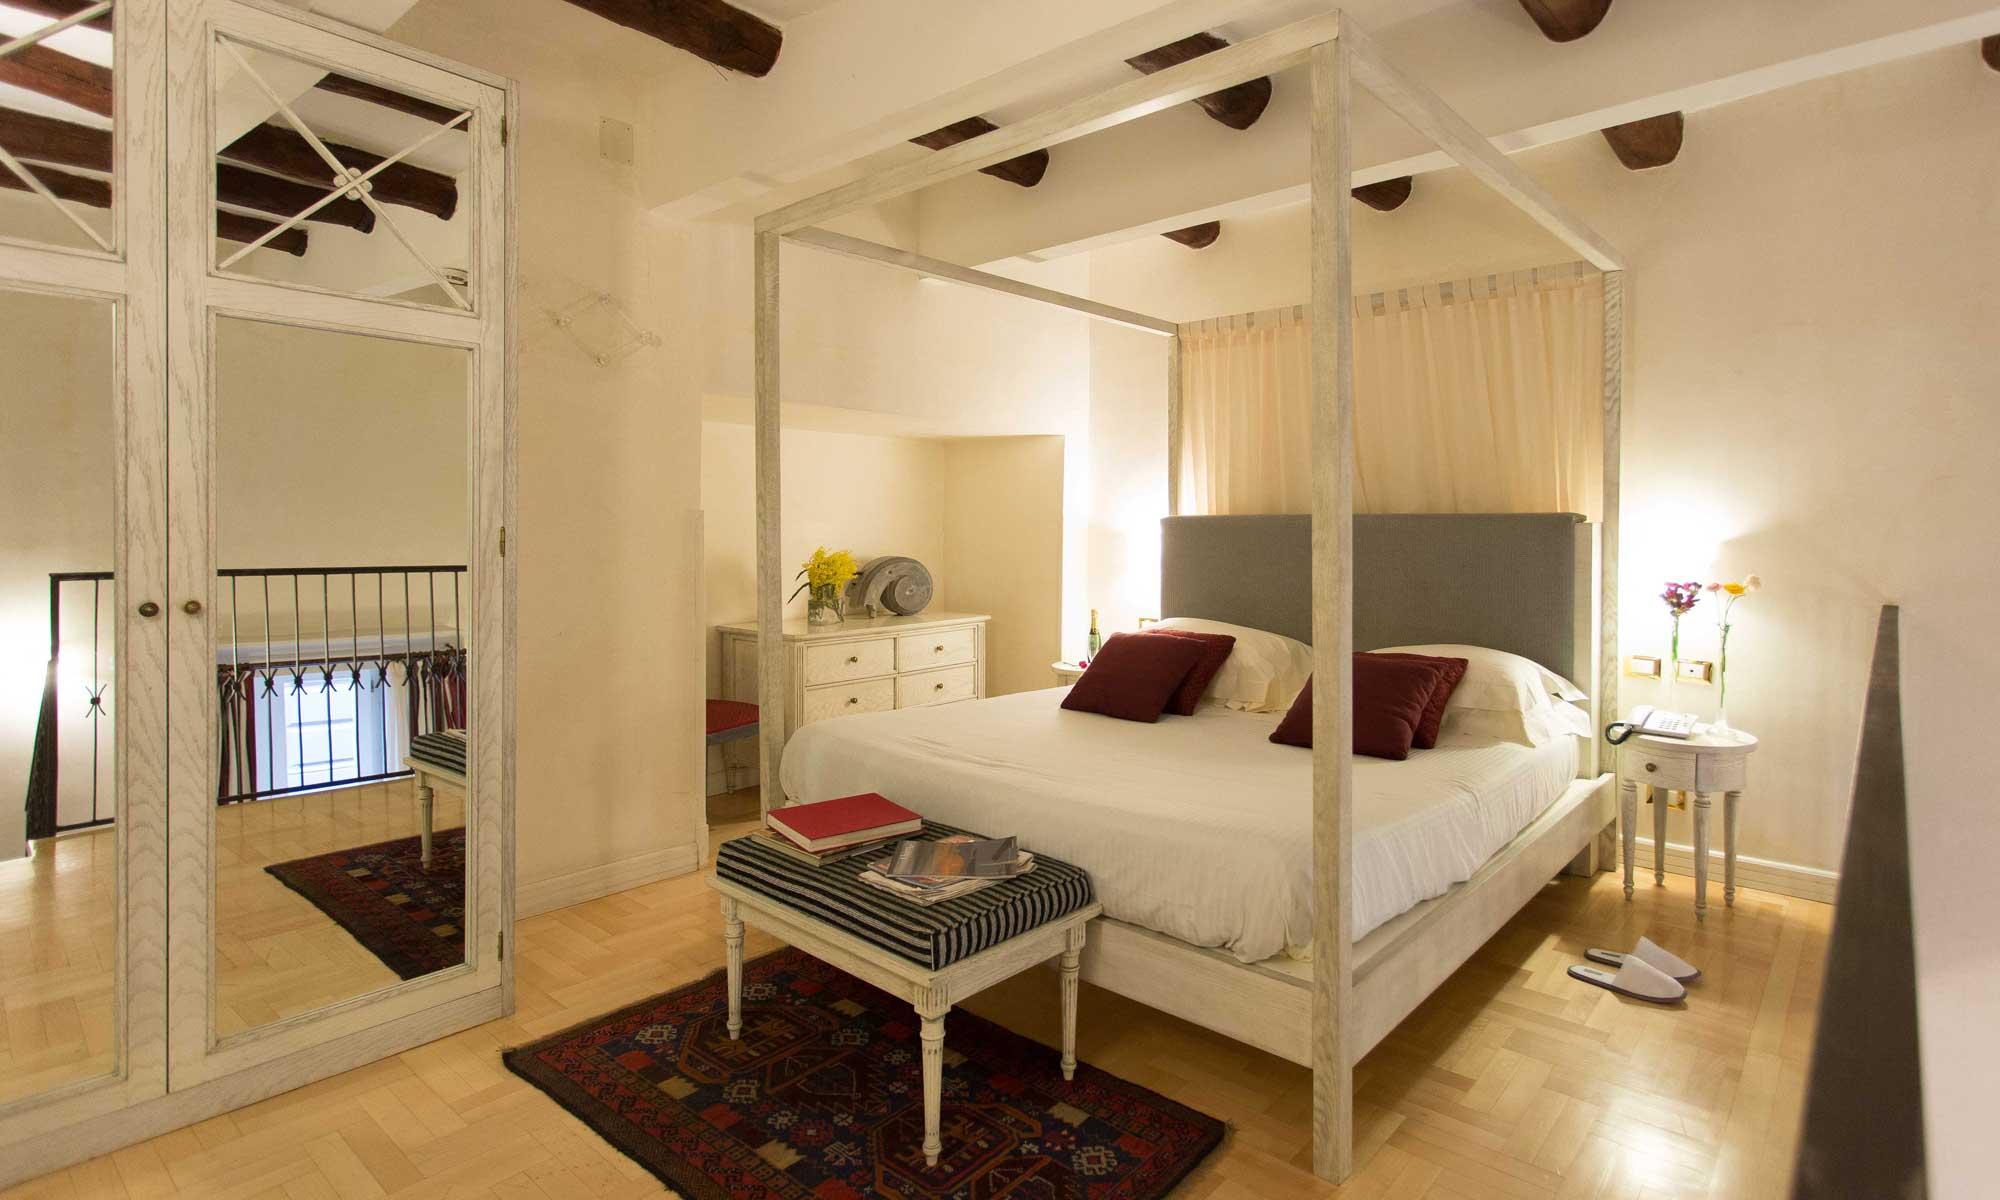 Costantinopoli 104 hotel de charme à Naples, Italie : Junior Suite